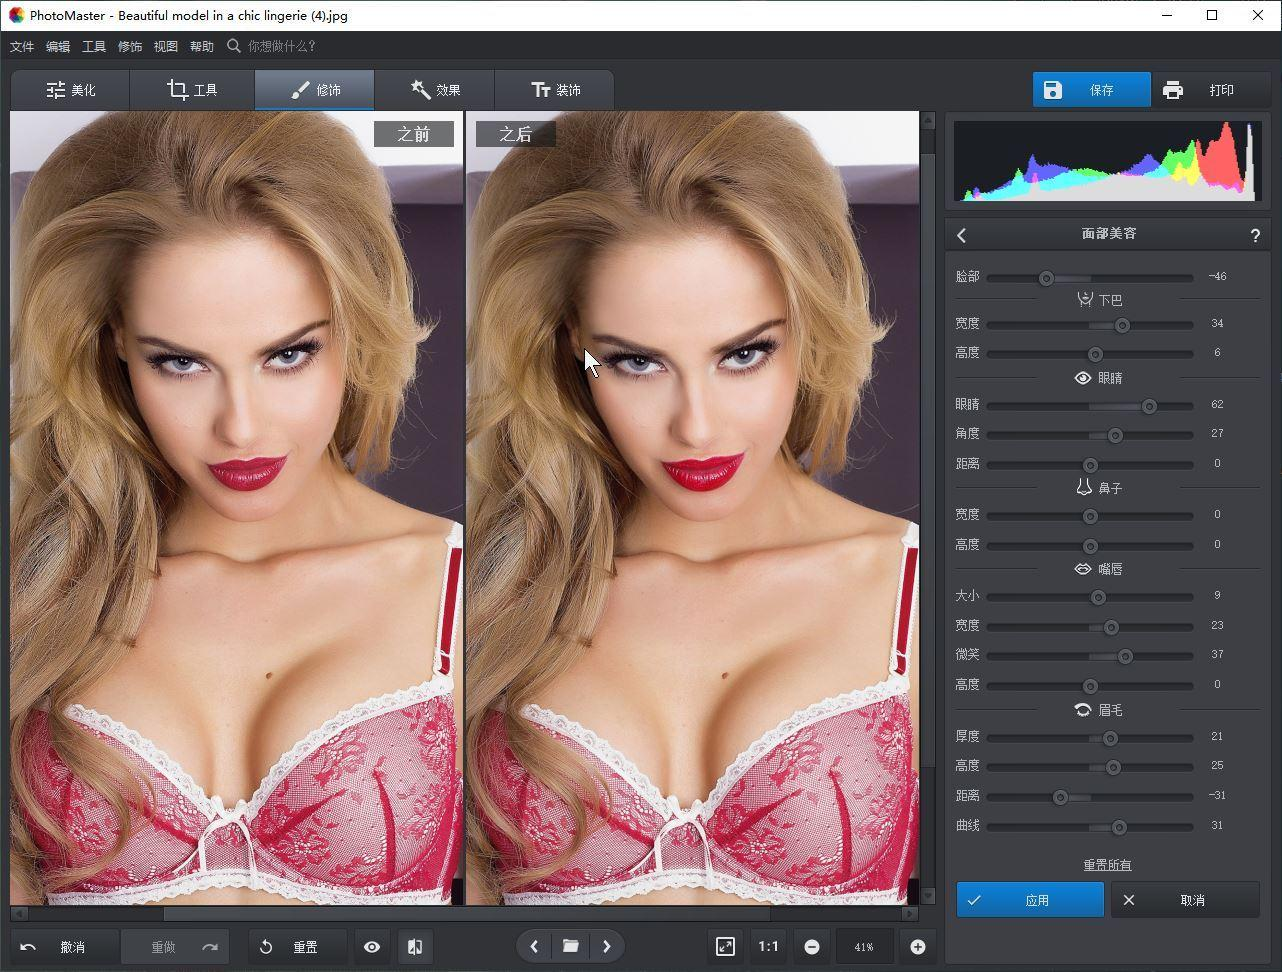 VIP资源-智能图像编辑软件AMS Software PhotoWorks/PhotoMaster 10.0中文直装版(11)